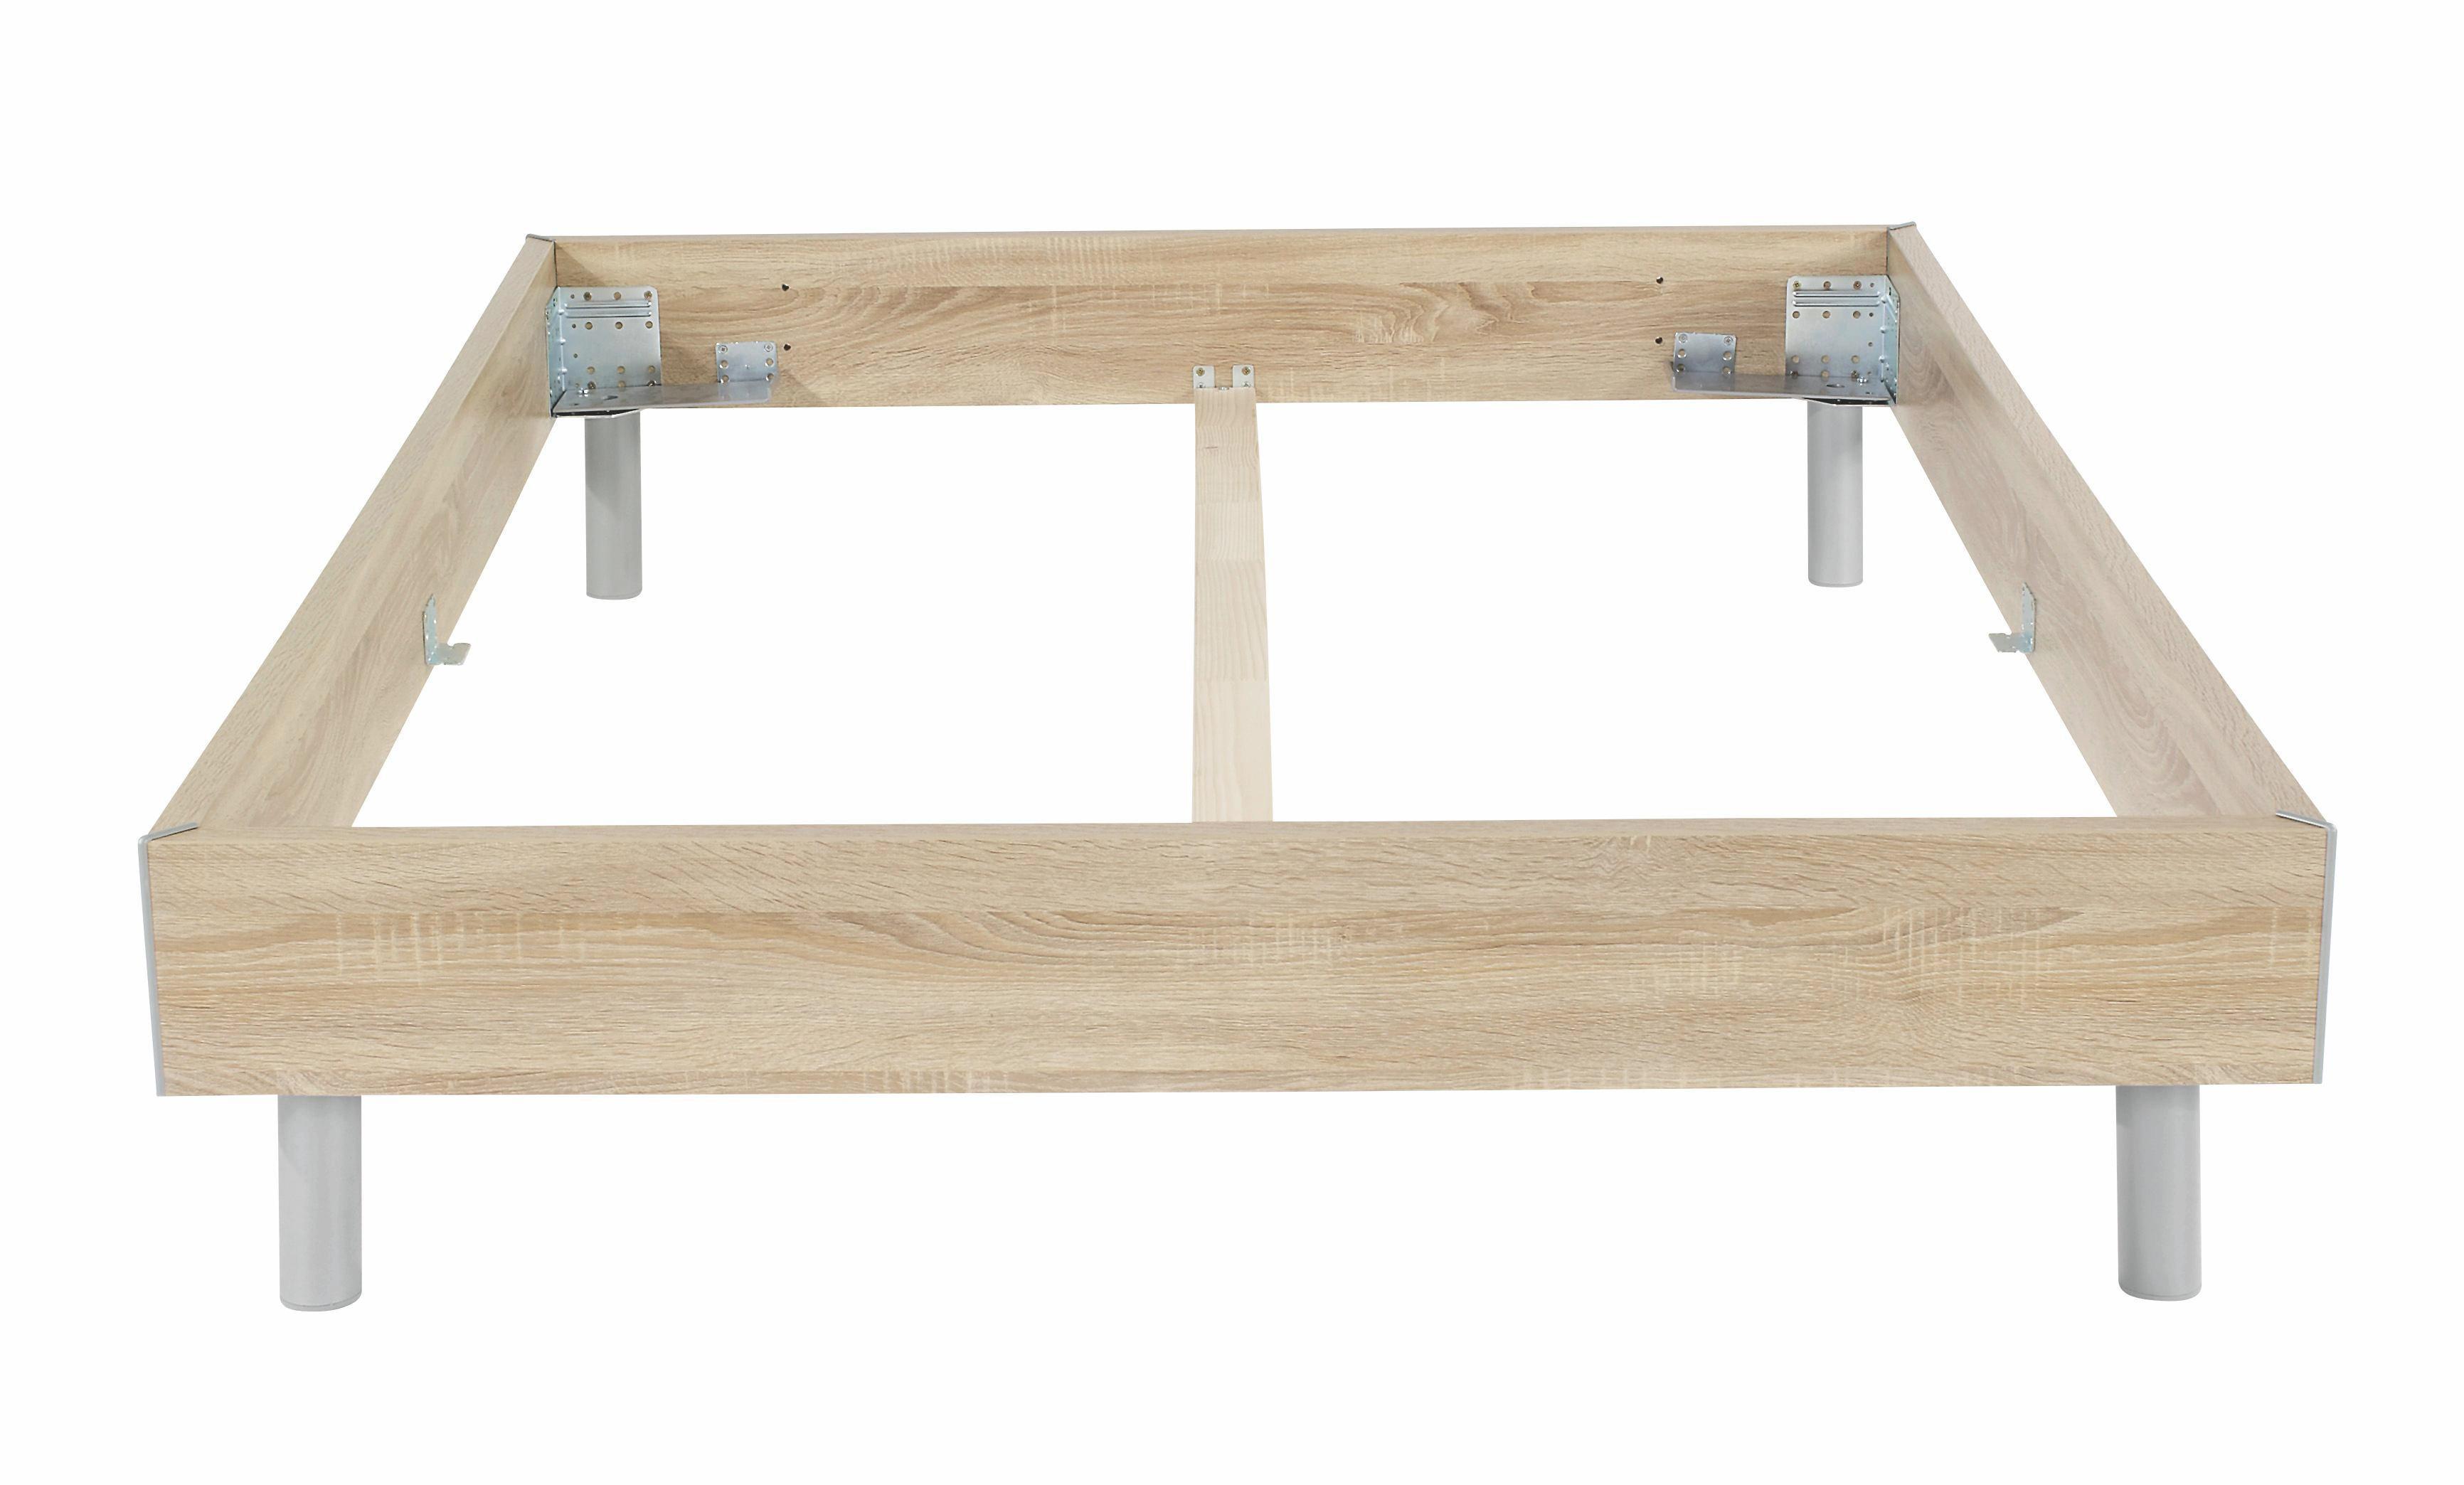 Futonbettrahmen Belia, 140x200 cm - Alufarben, KONVENTIONELL, Holz (140/200cm)